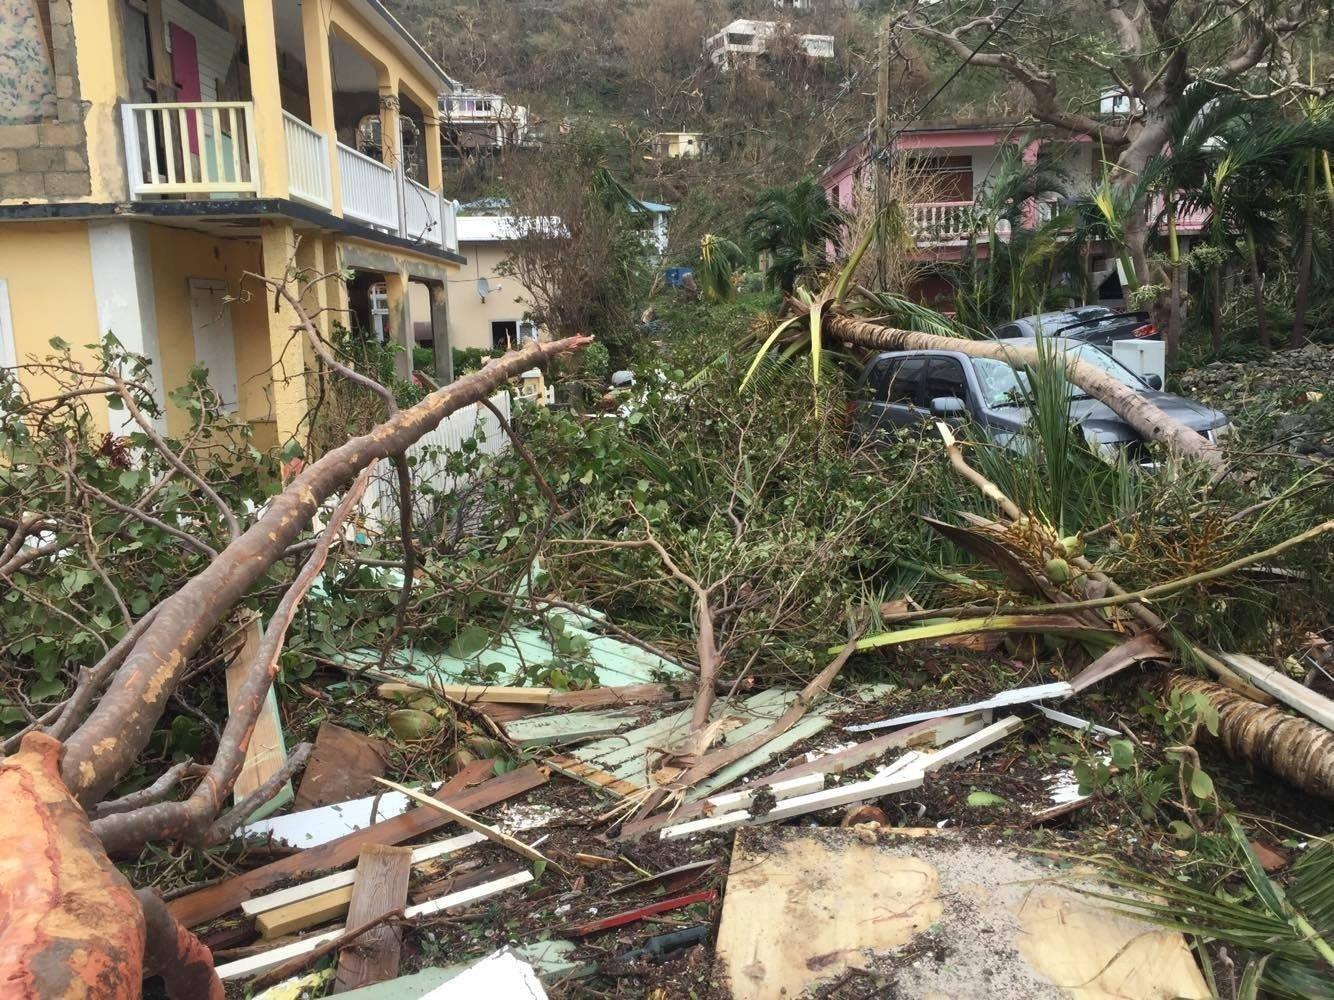 Andrew Burruss was staying in Apple Bay British Virgin Islands when Hurricane Irma barrelled through. Shot